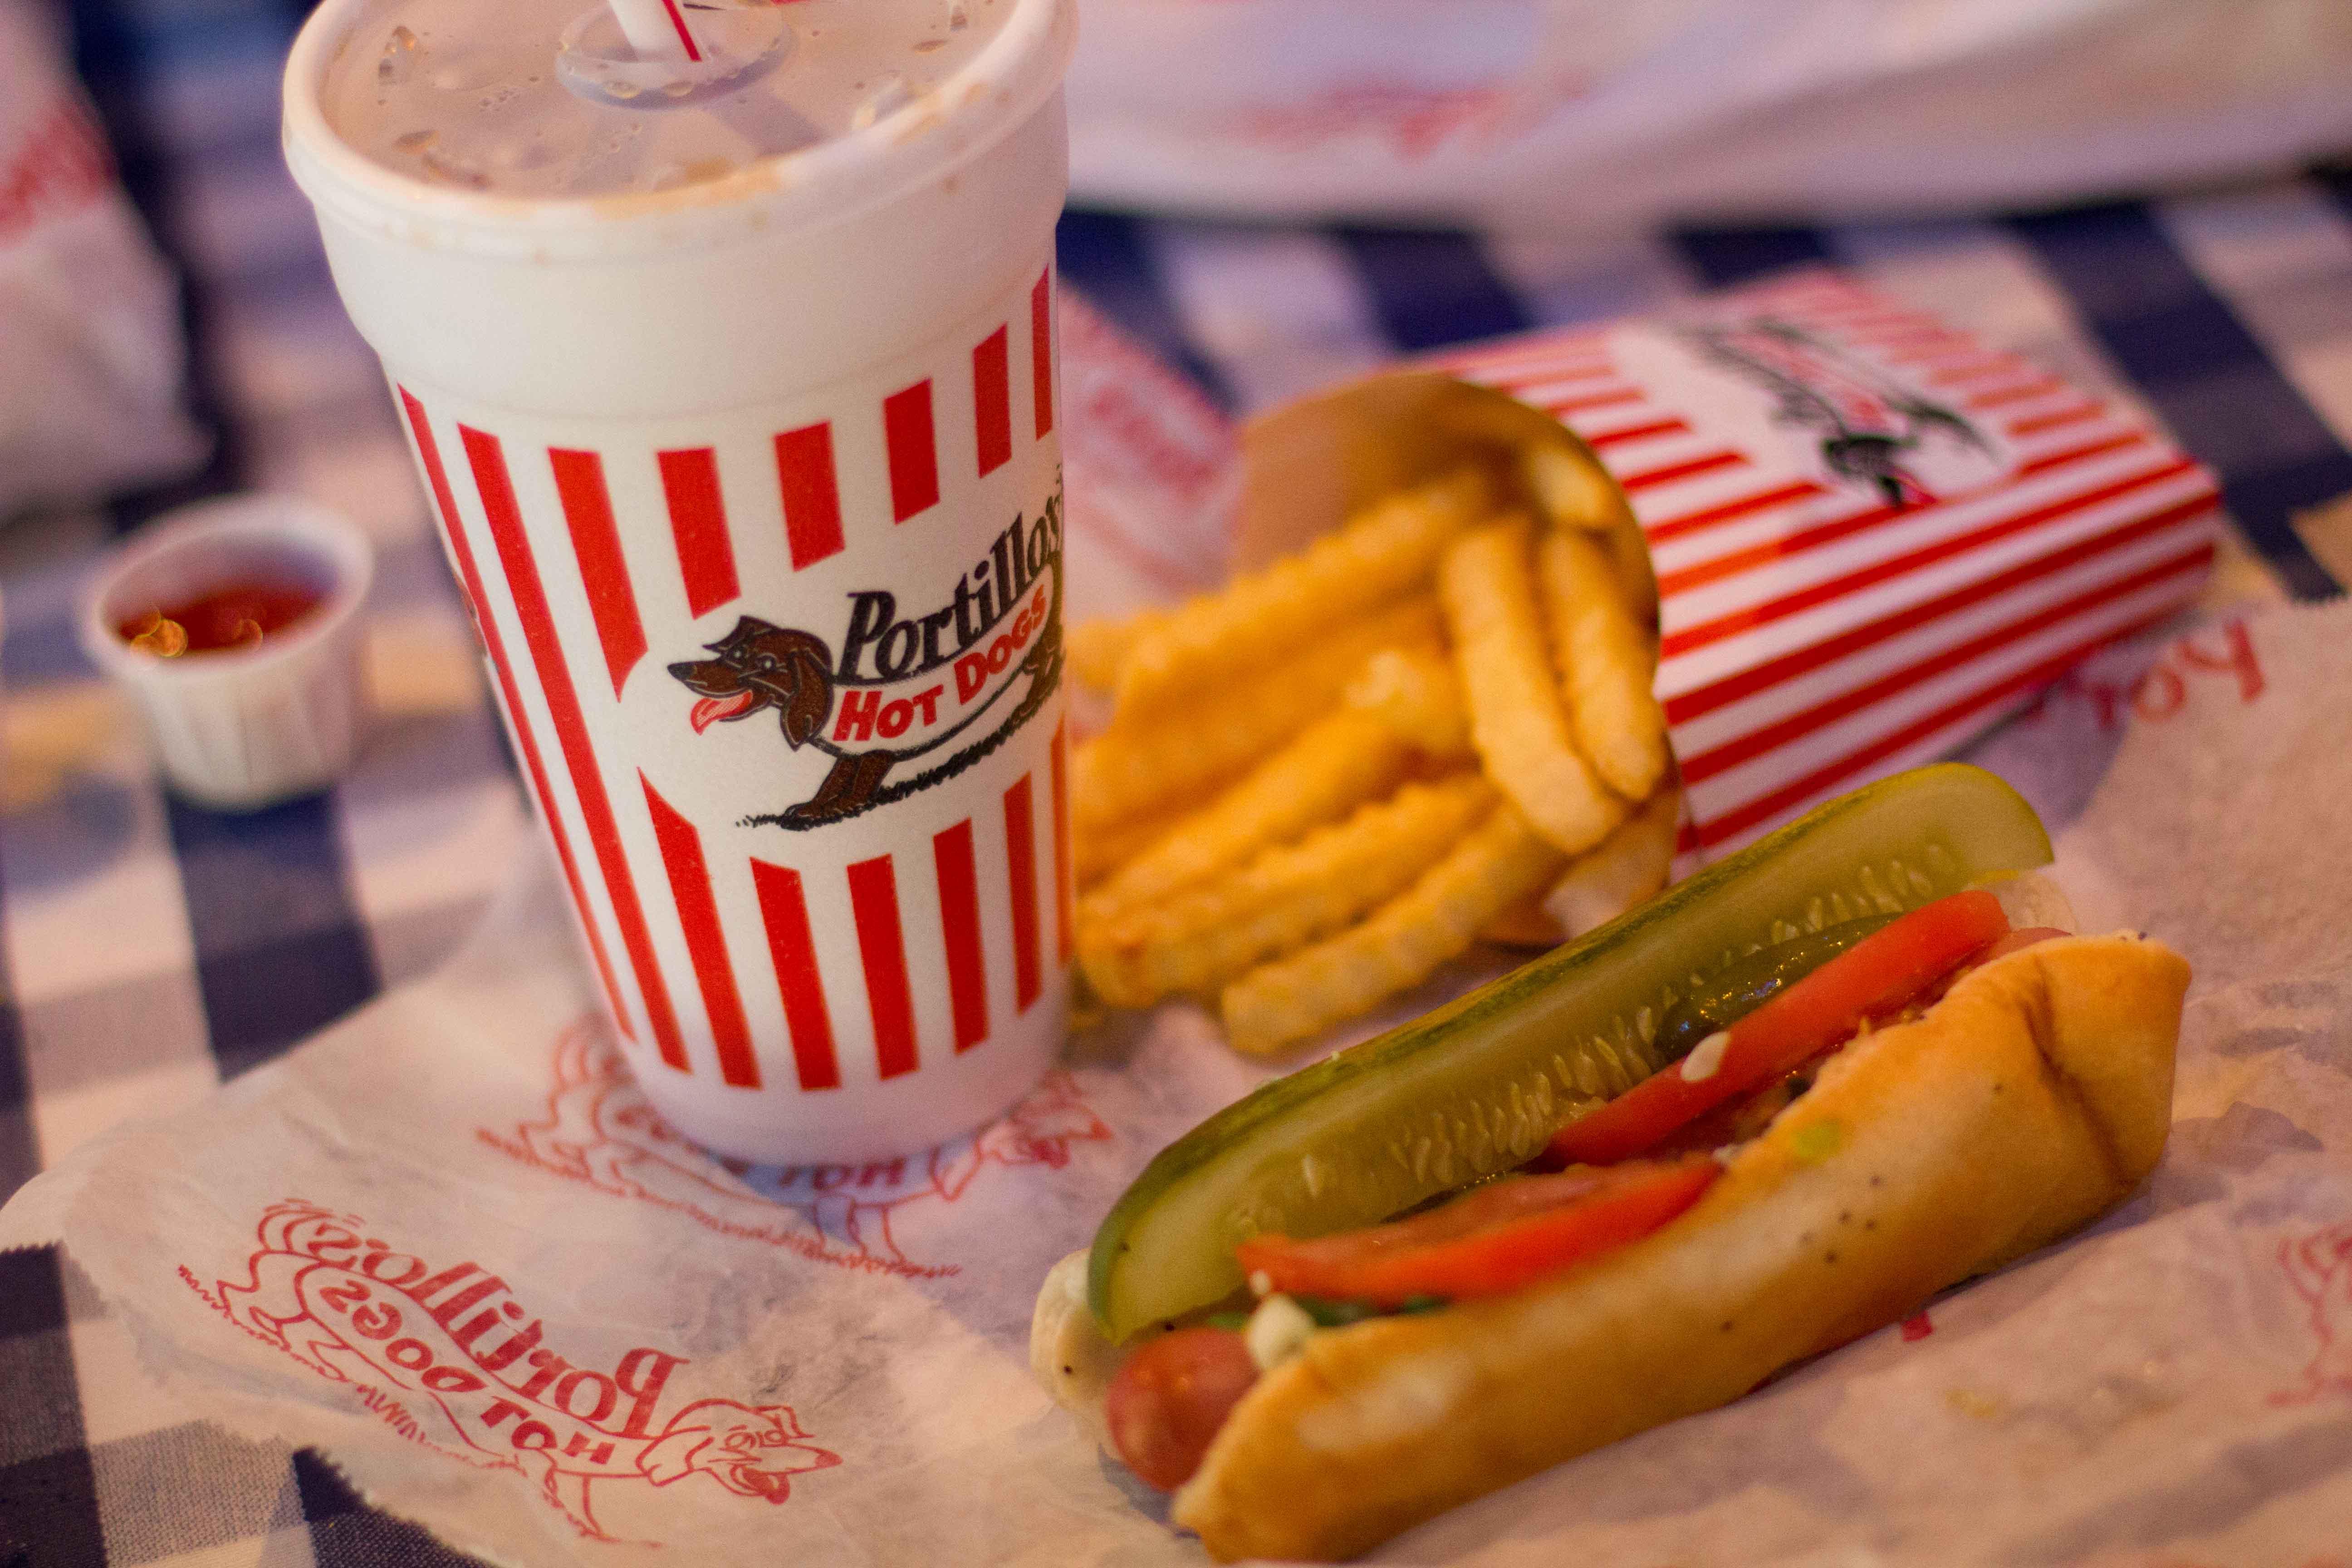 Portillos Hot Dog Recipe